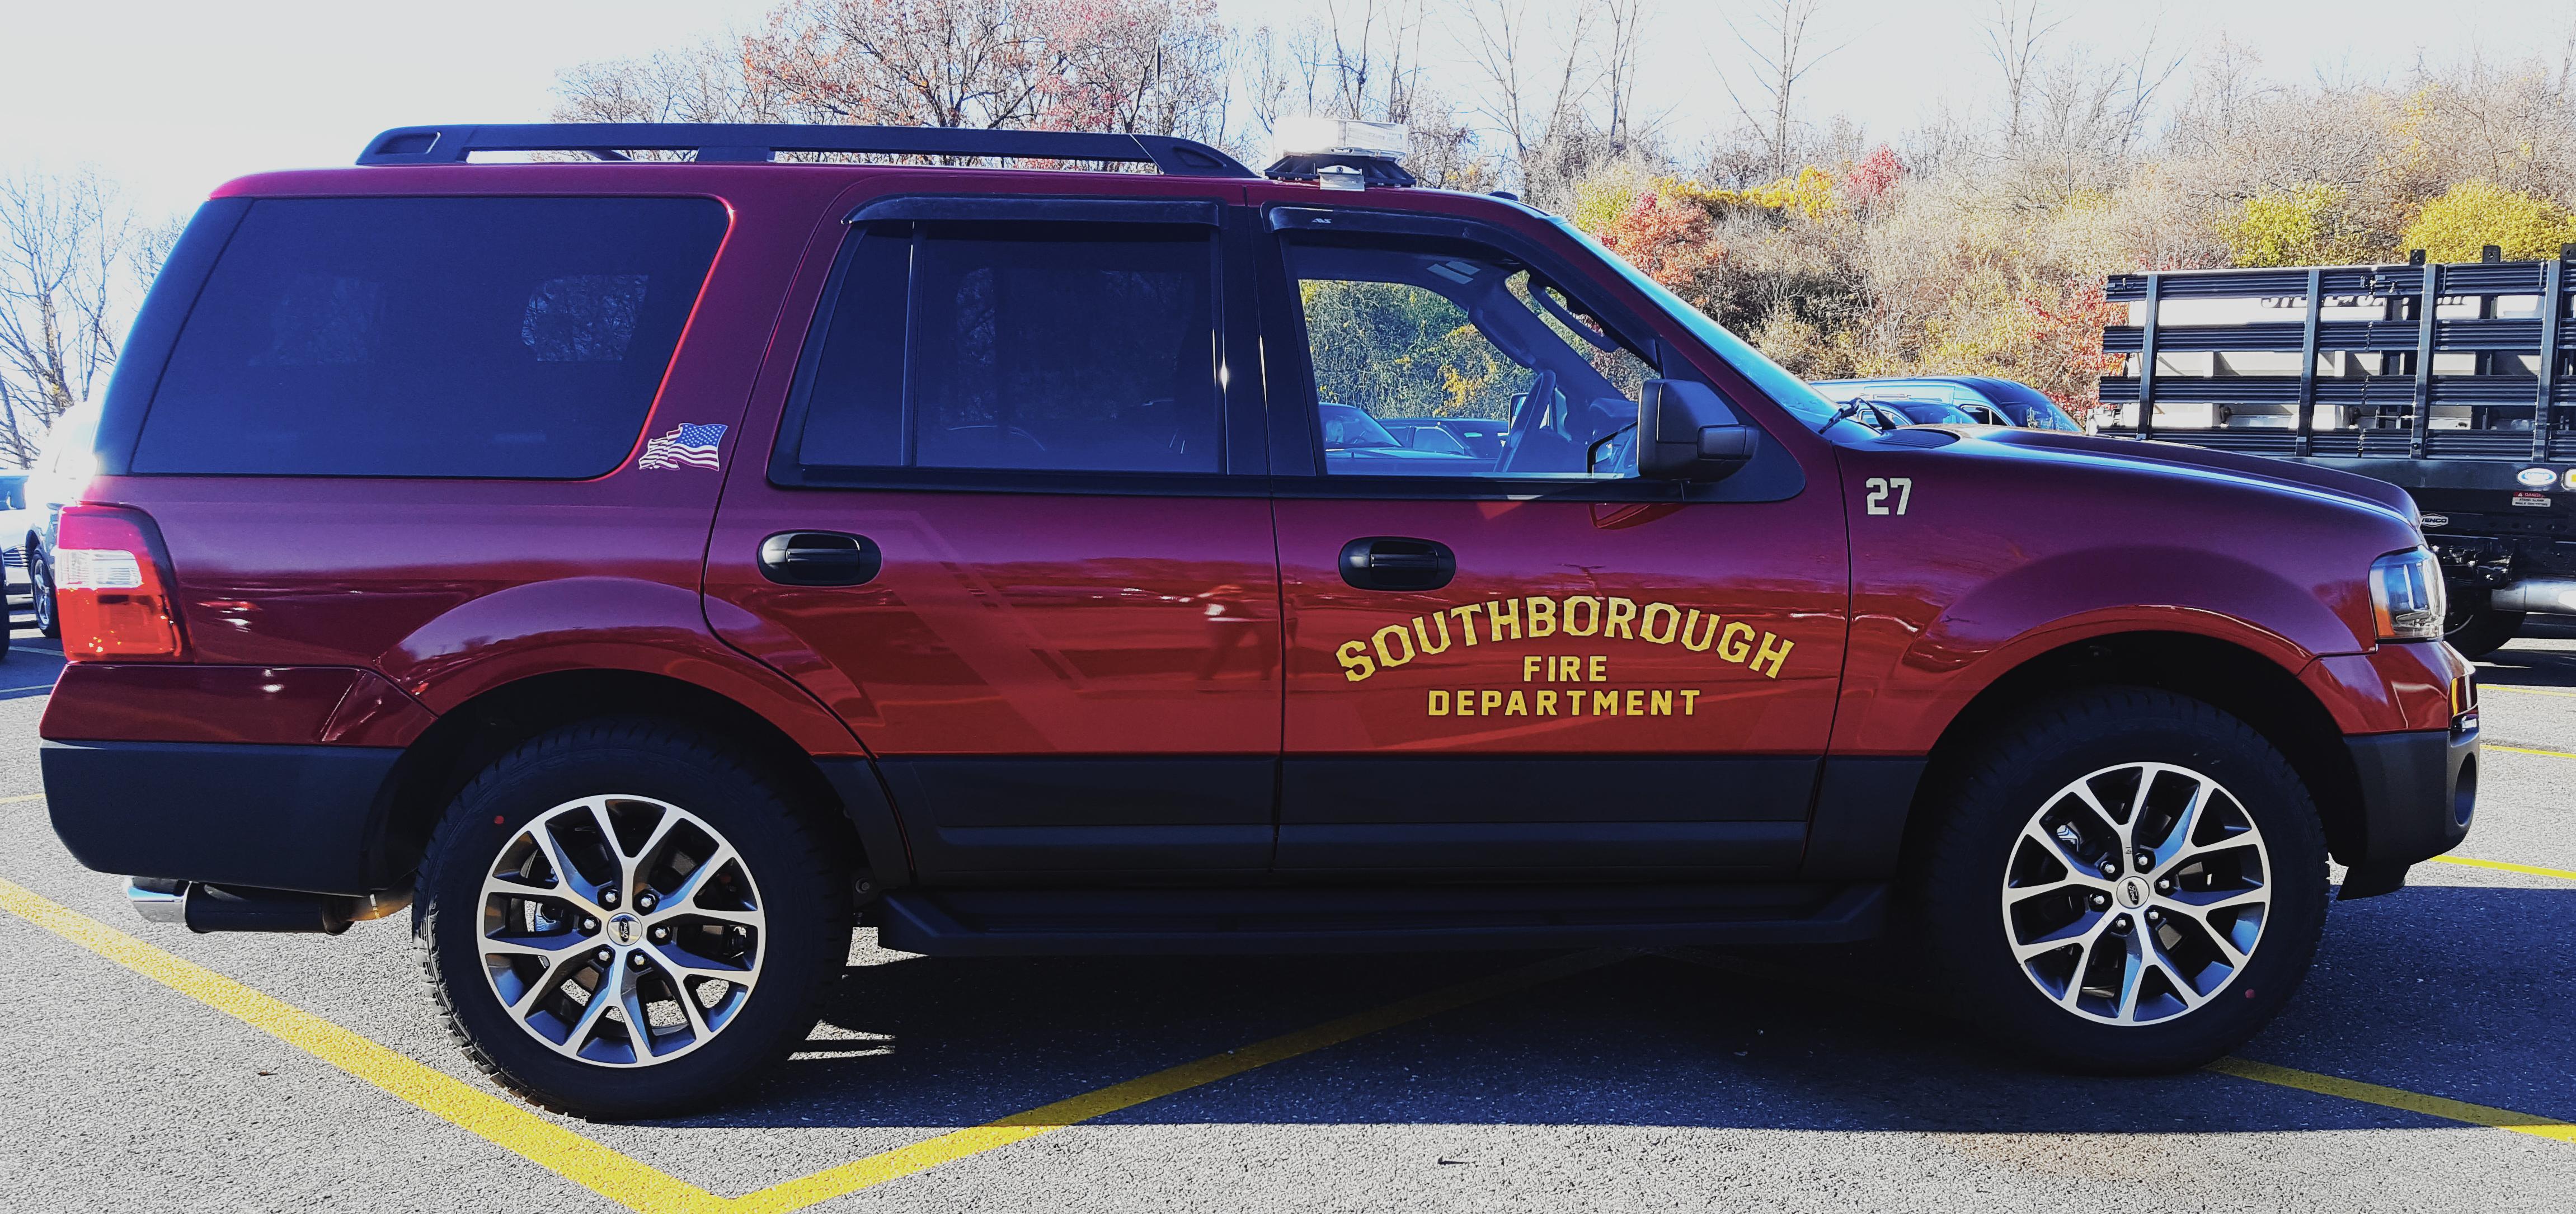 Southborough Fire